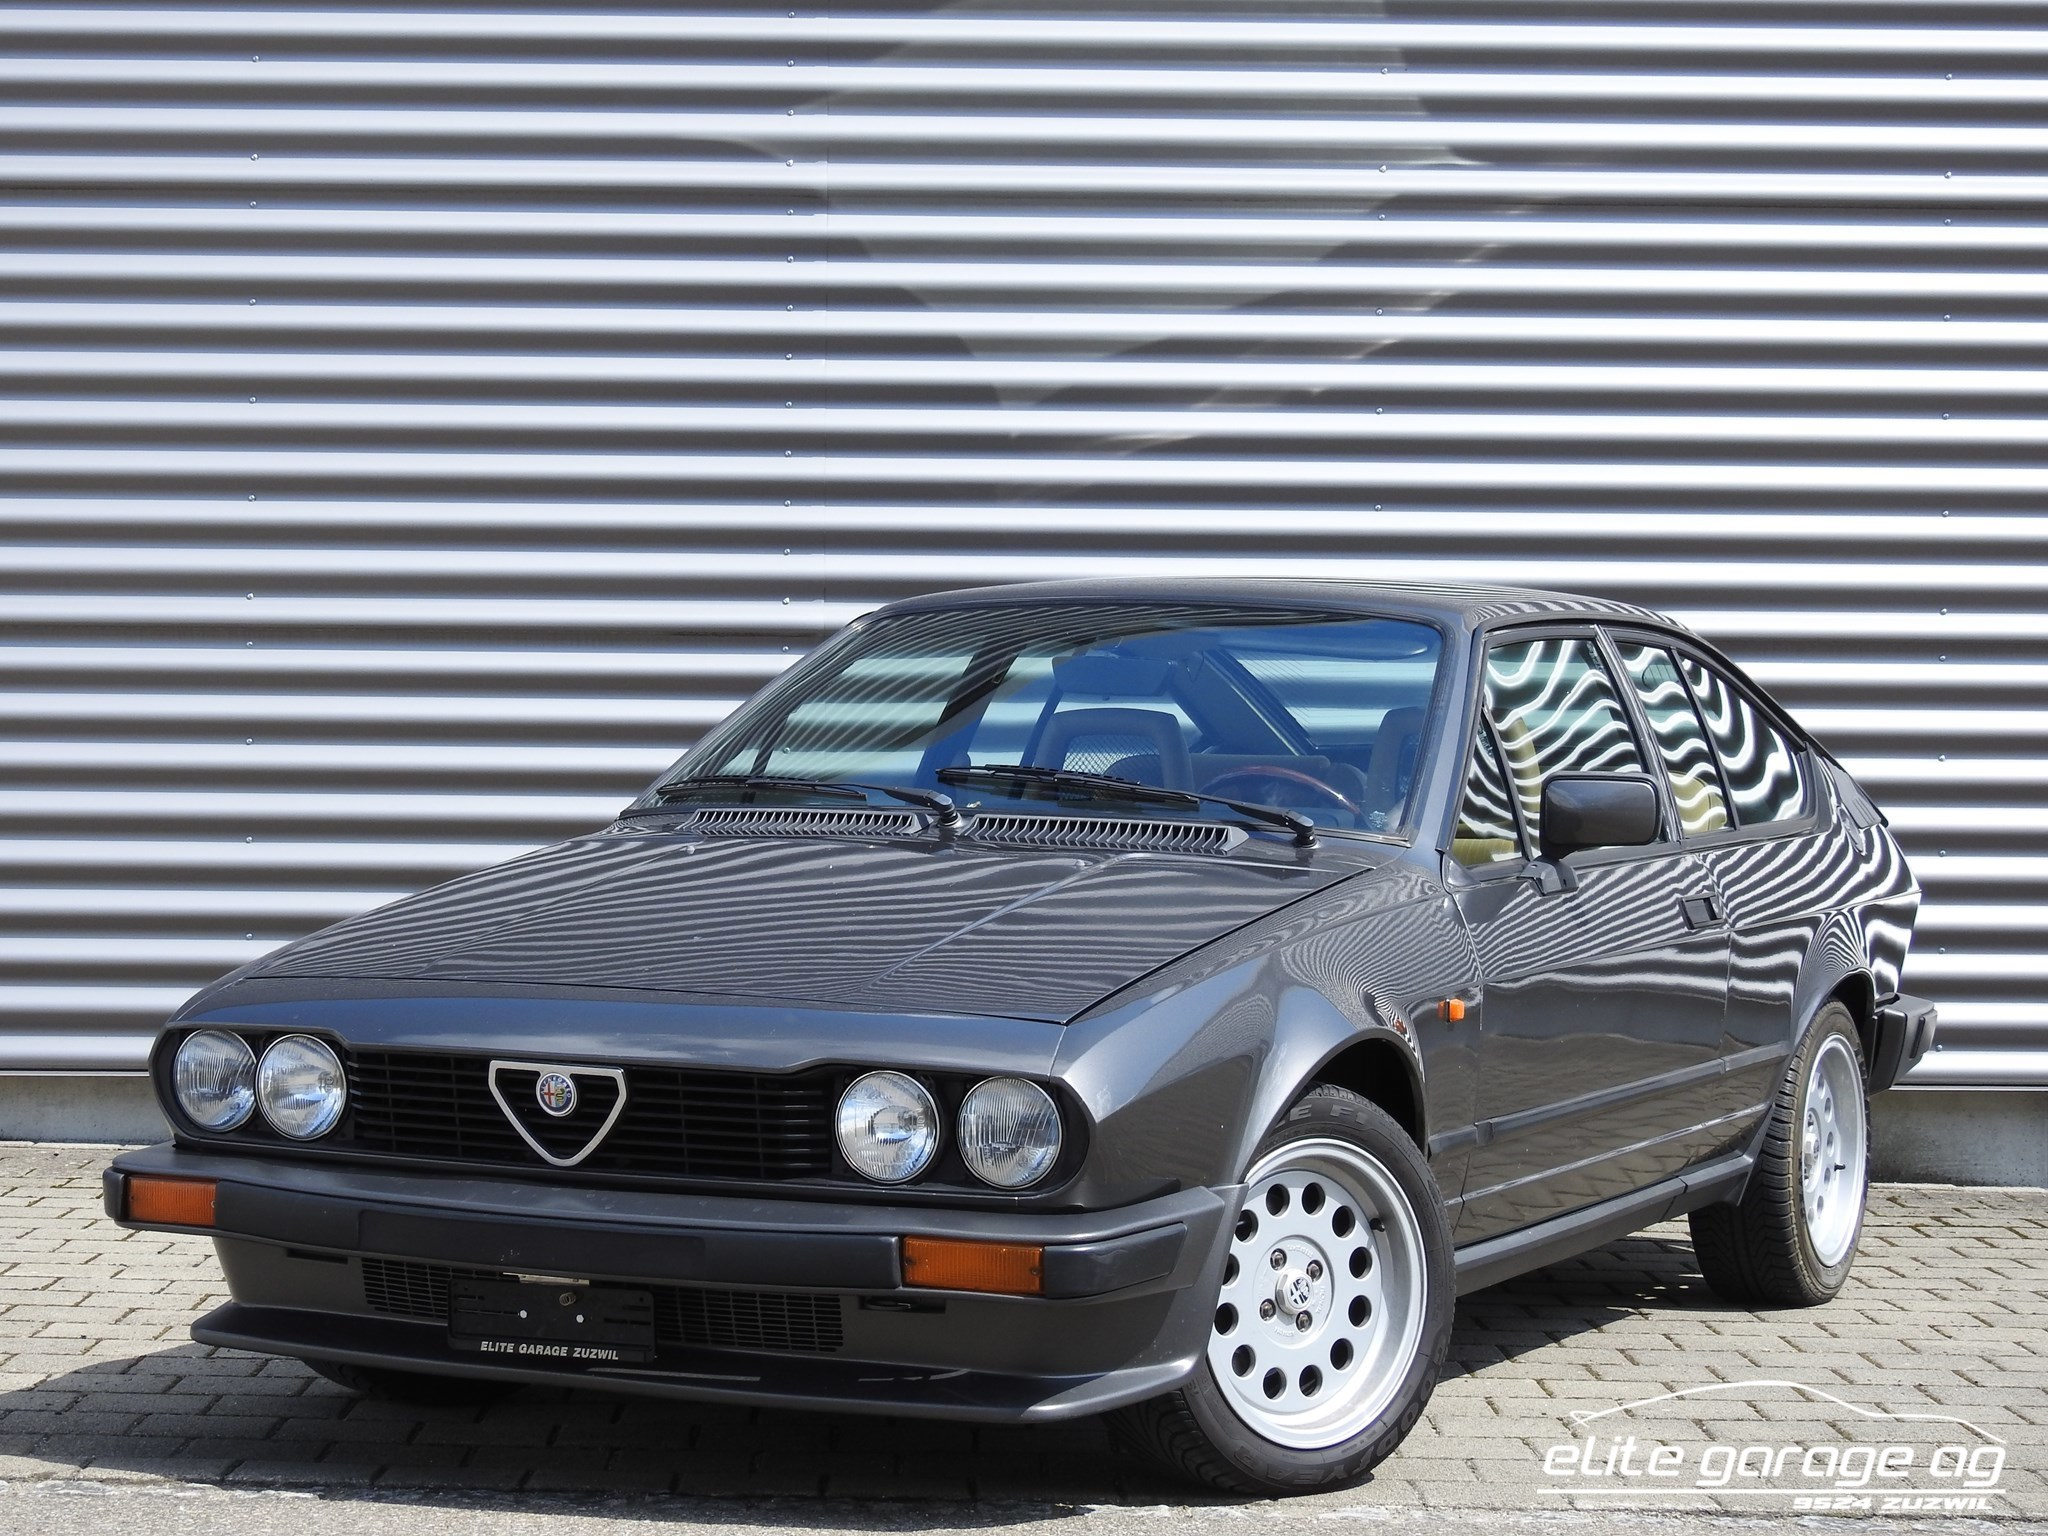 coupe Alfa Romeo GTV 2.0 L